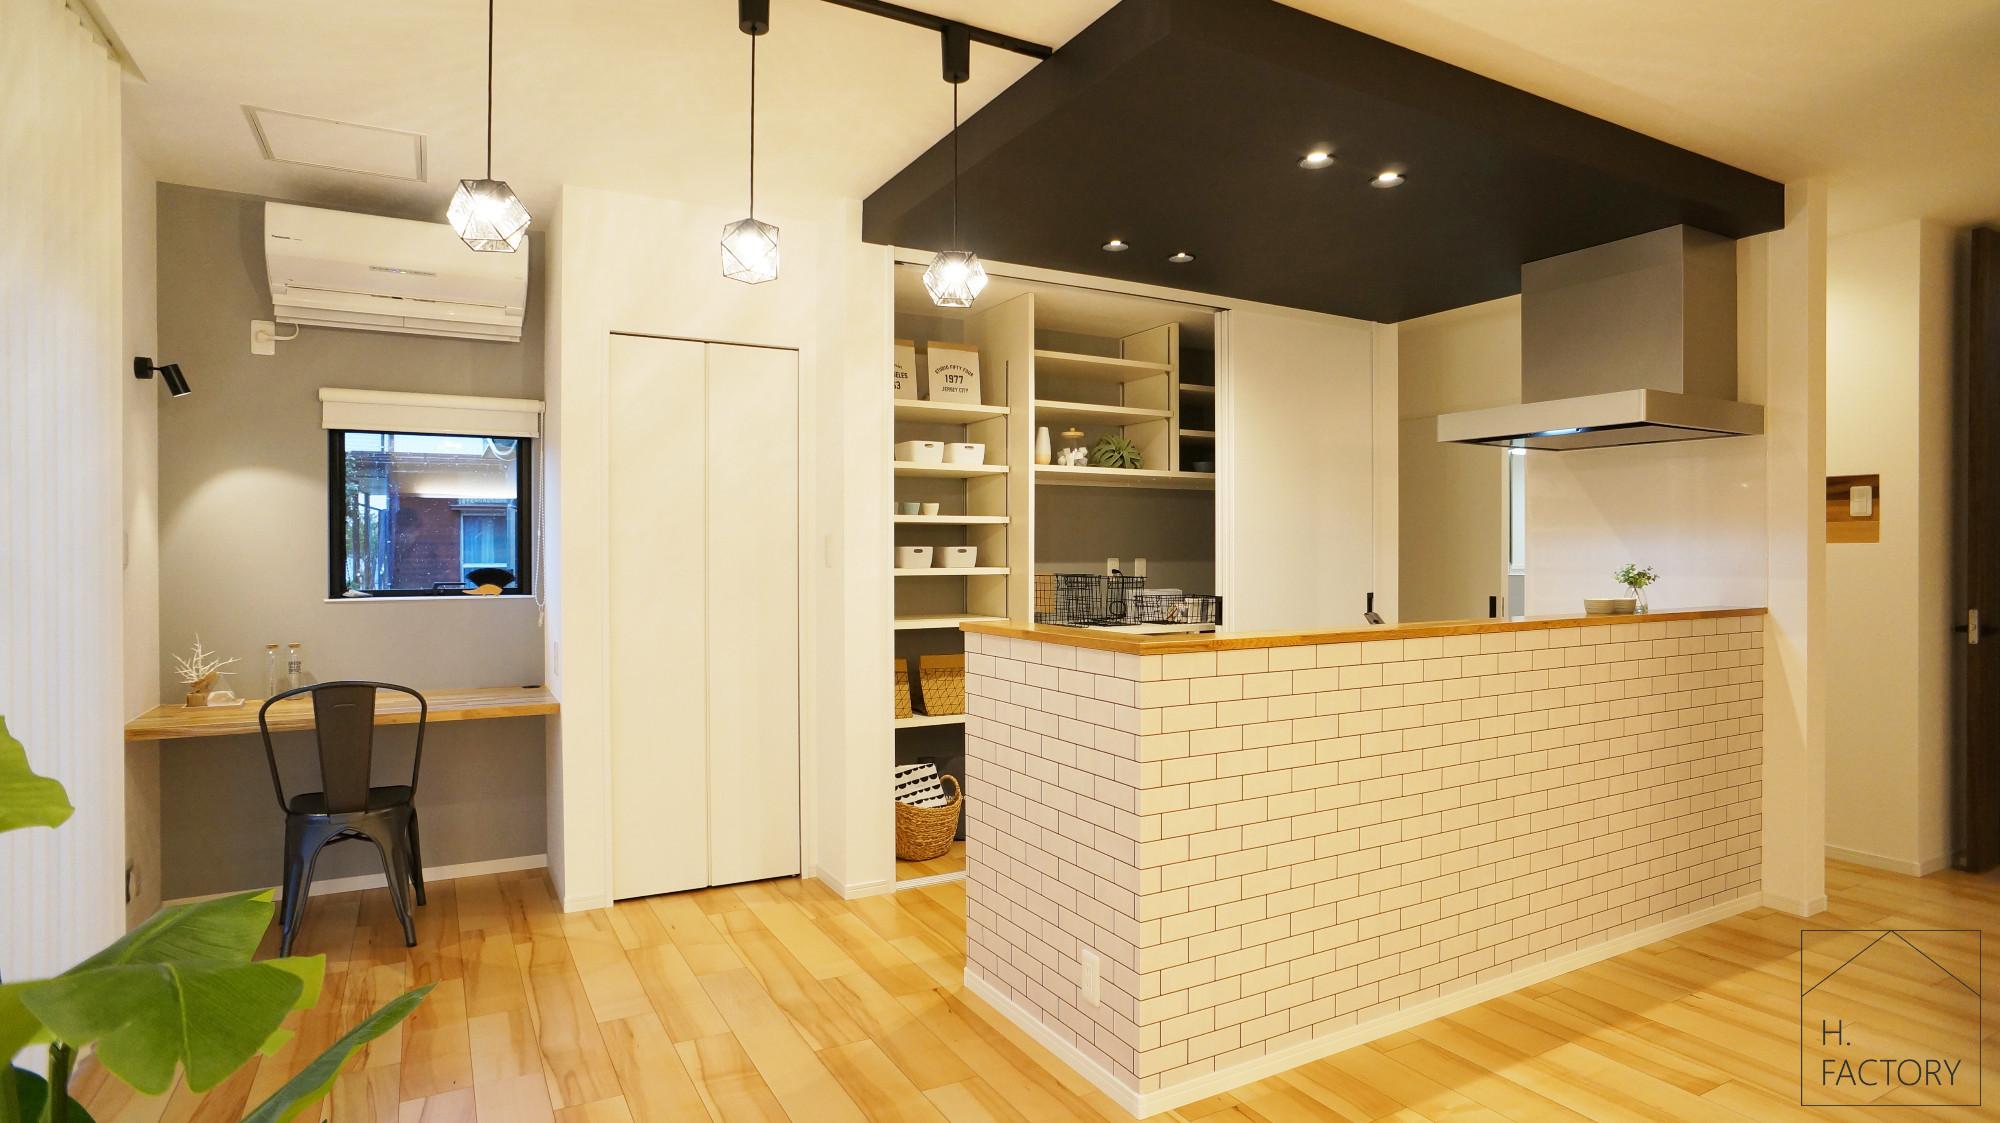 H.FACTORY/株式会社 橋本技建「シンプル&ベーシックなオシャレカフェのような家」のシンプル・ナチュラルなキッチンの実例写真